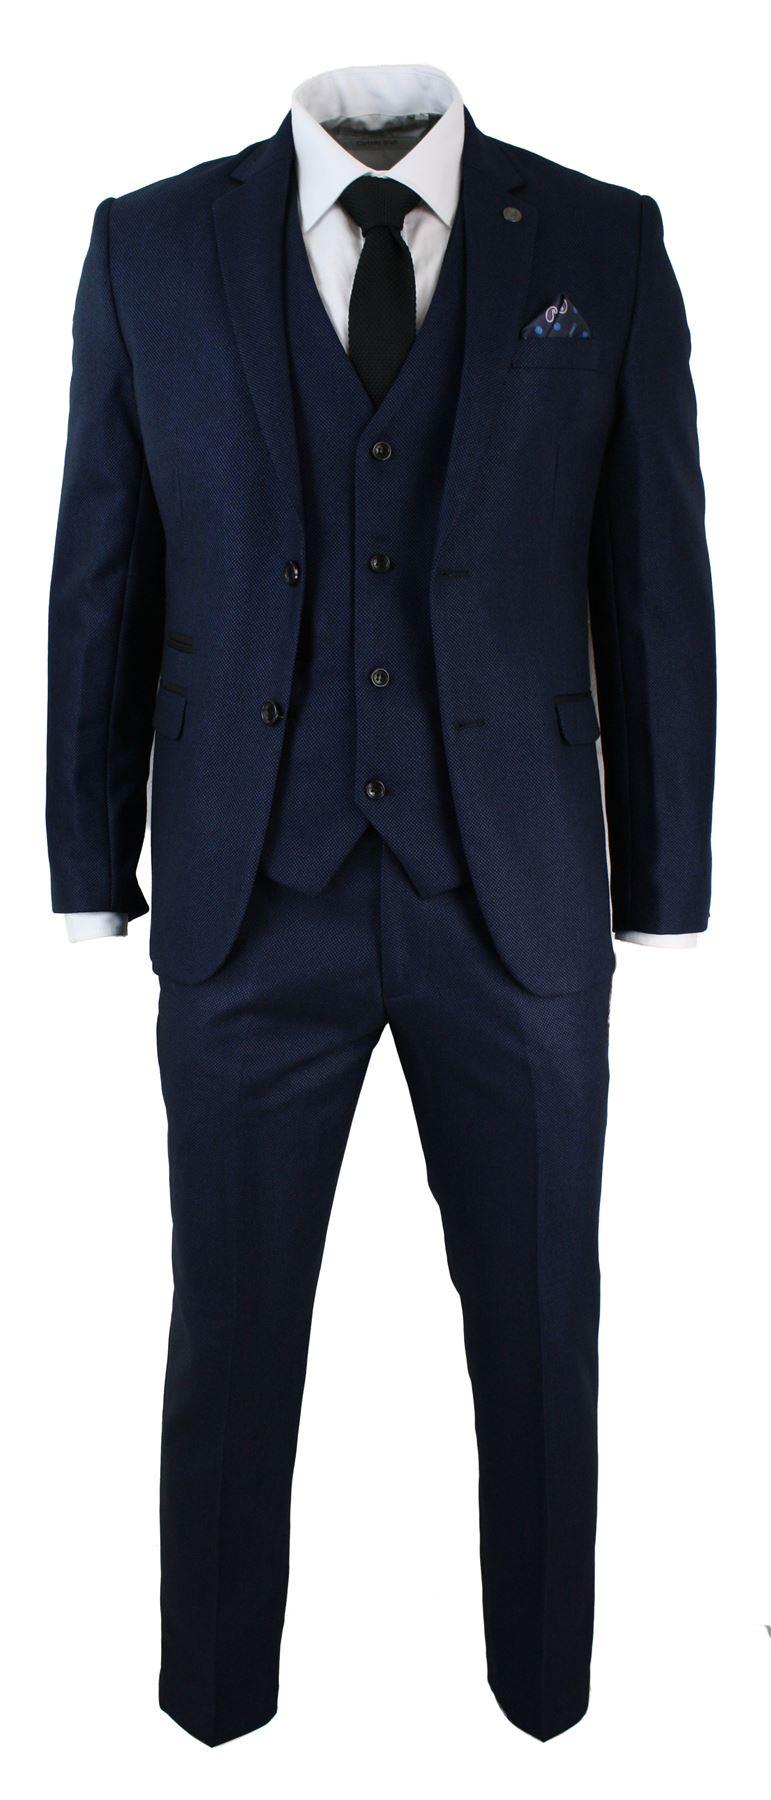 costume 3 pi ces homme coupe ceintr e bleu noir habill chic formel mariages ebay. Black Bedroom Furniture Sets. Home Design Ideas